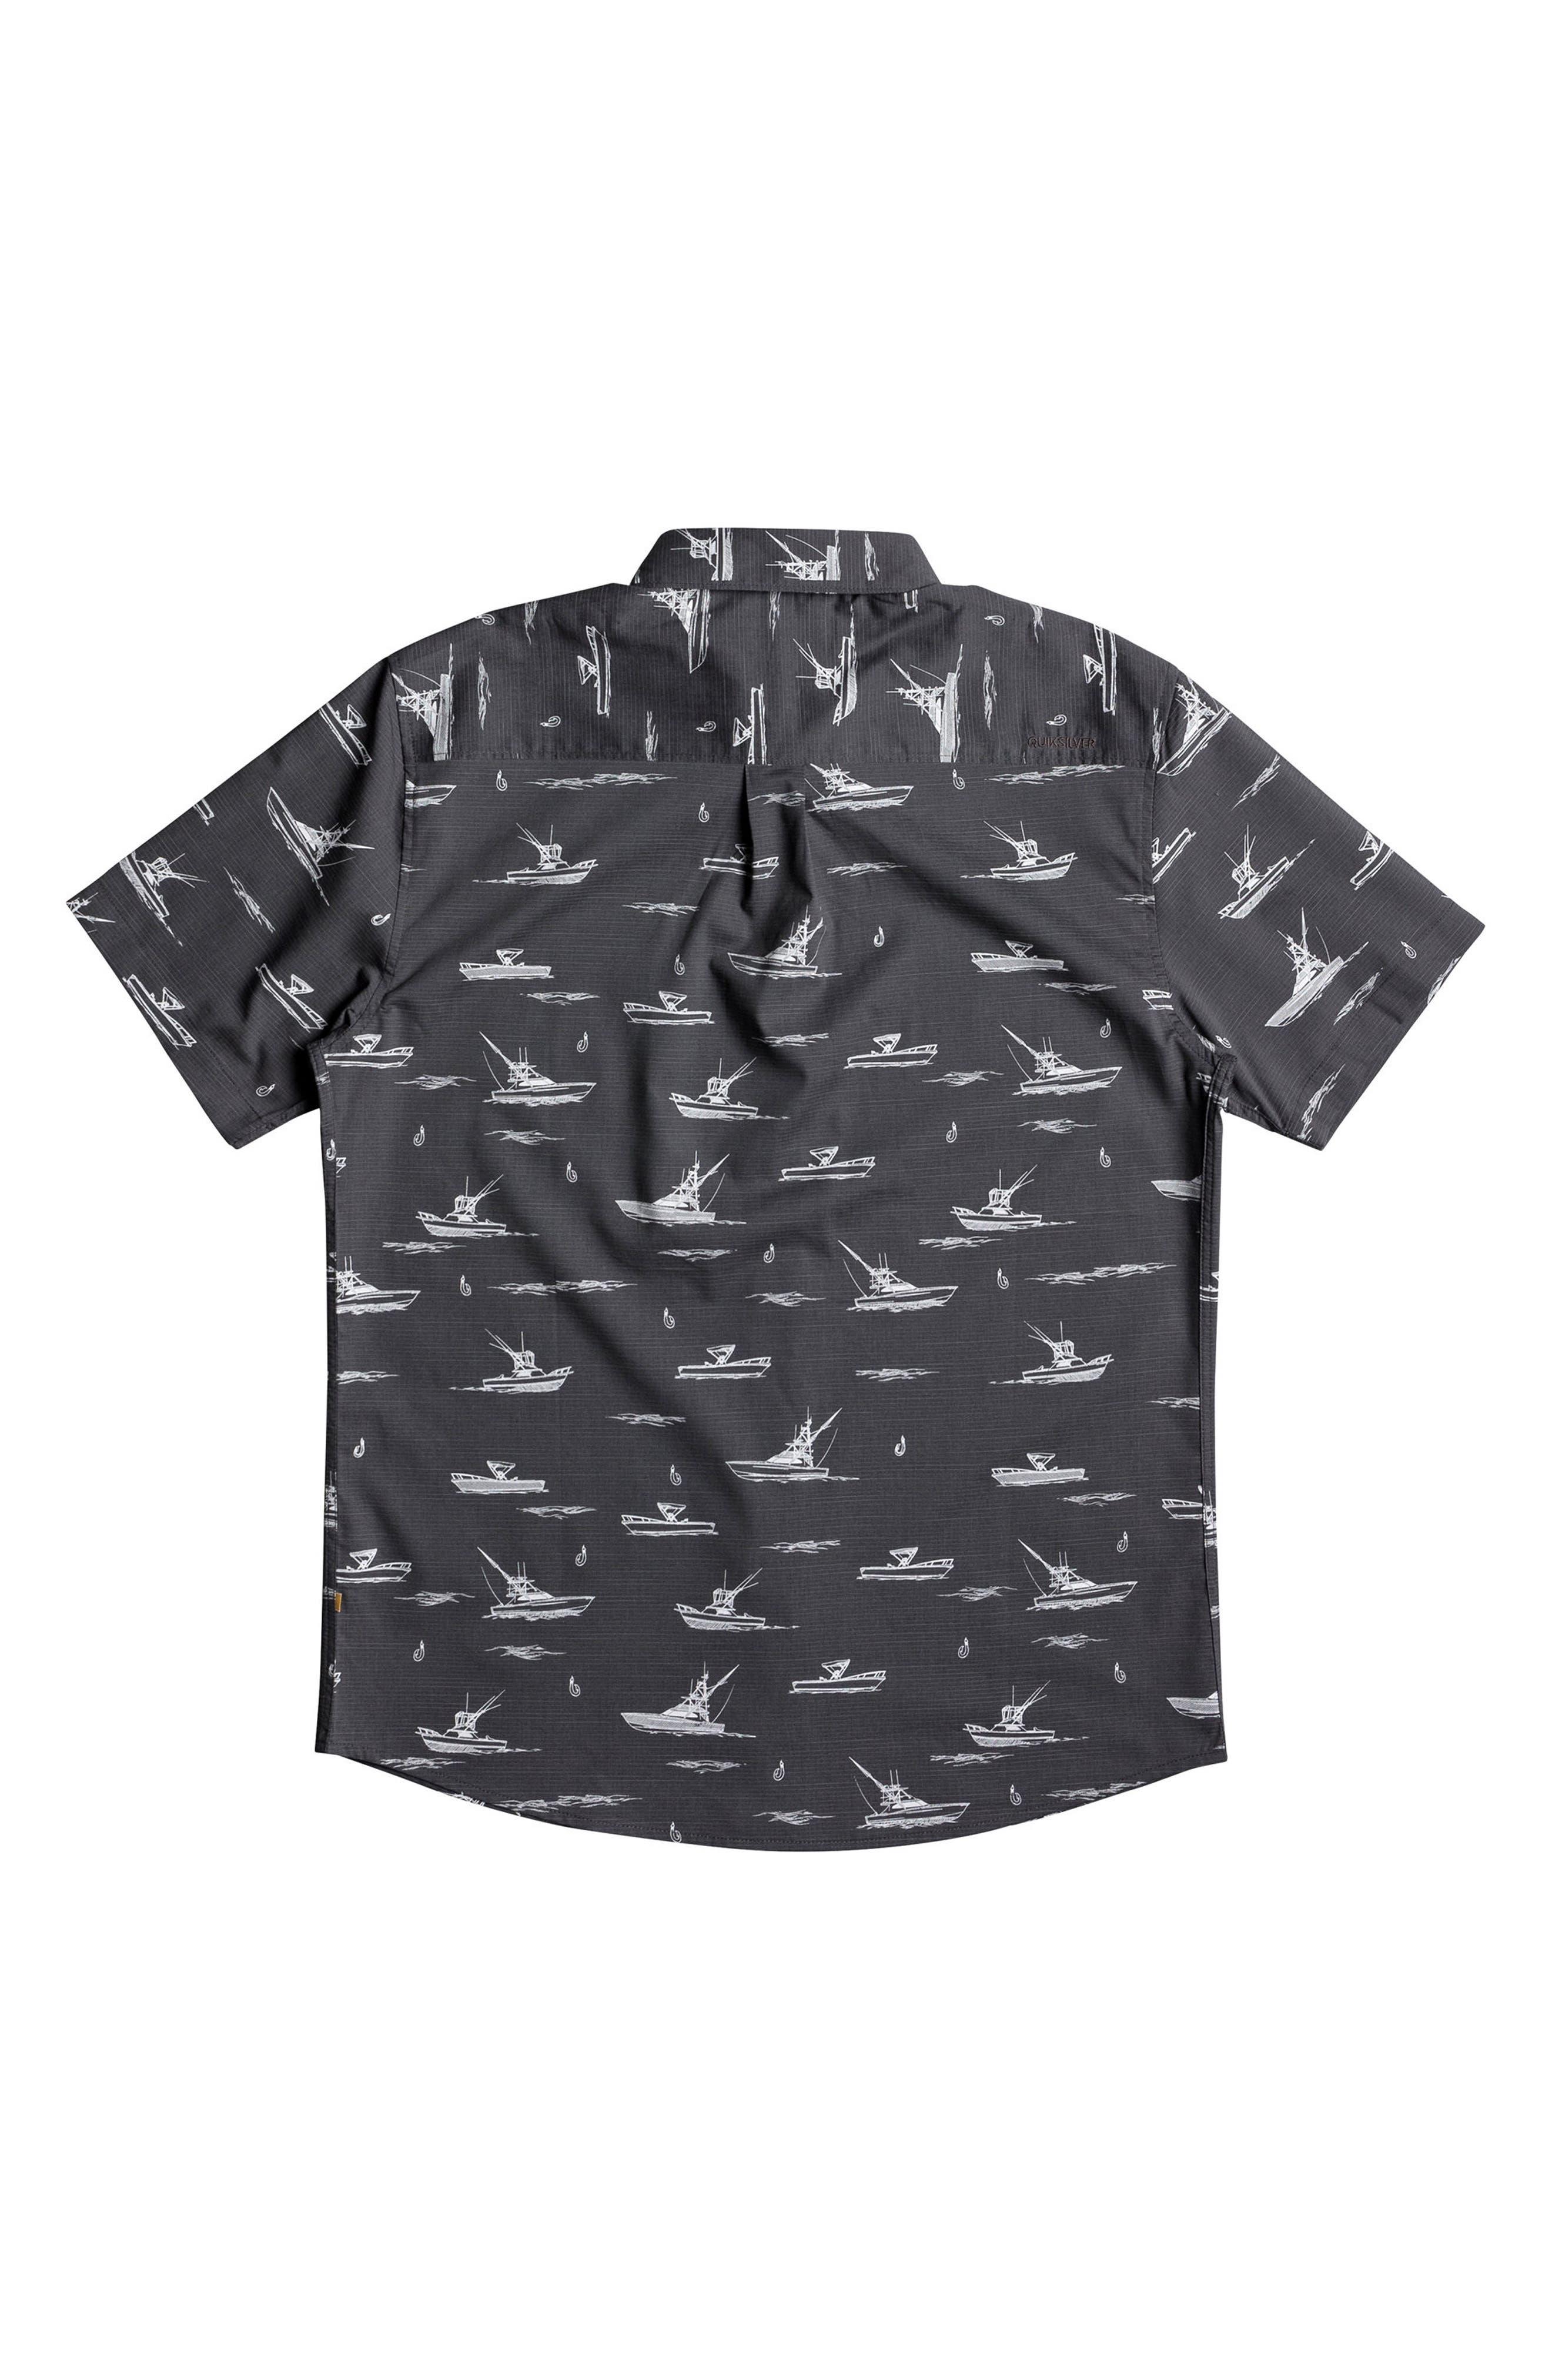 Fishboats Sport Shirt,                         Main,                         color, 008